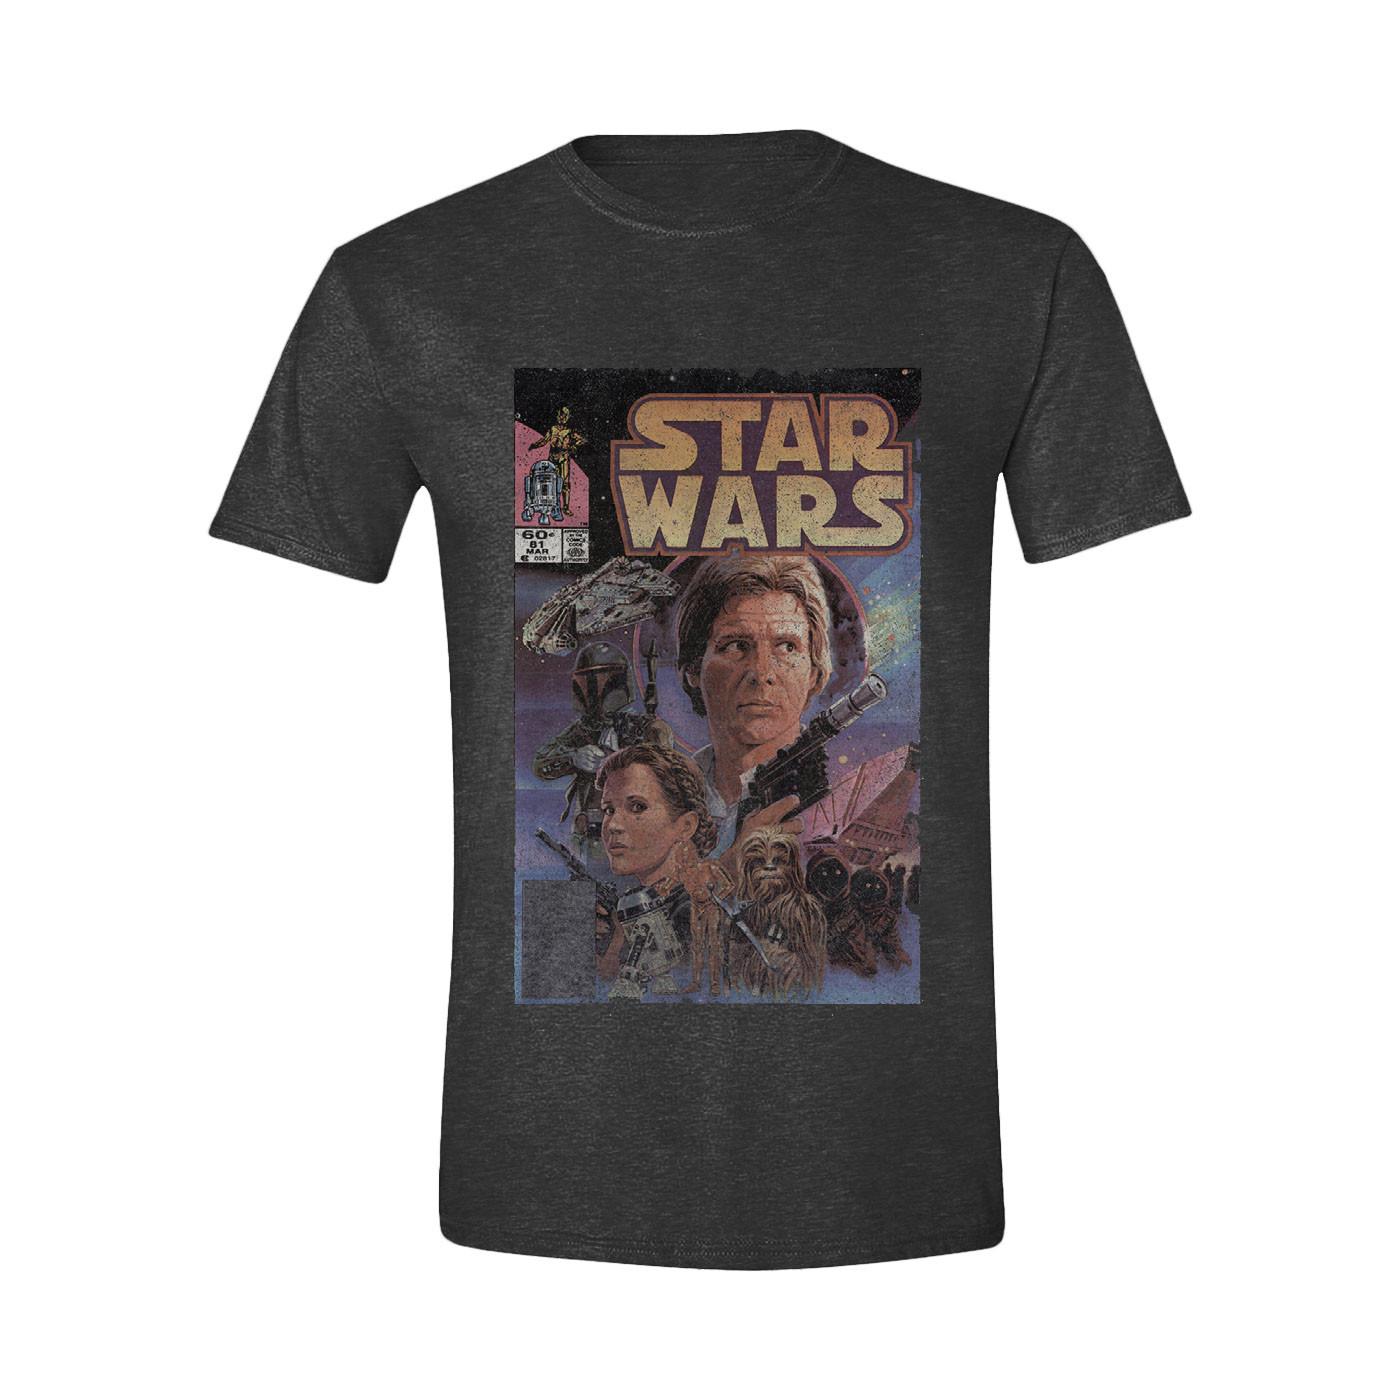 Time City Star Wars Han Solo Retro Anthracite Melange Black Men'S T-Shirt L